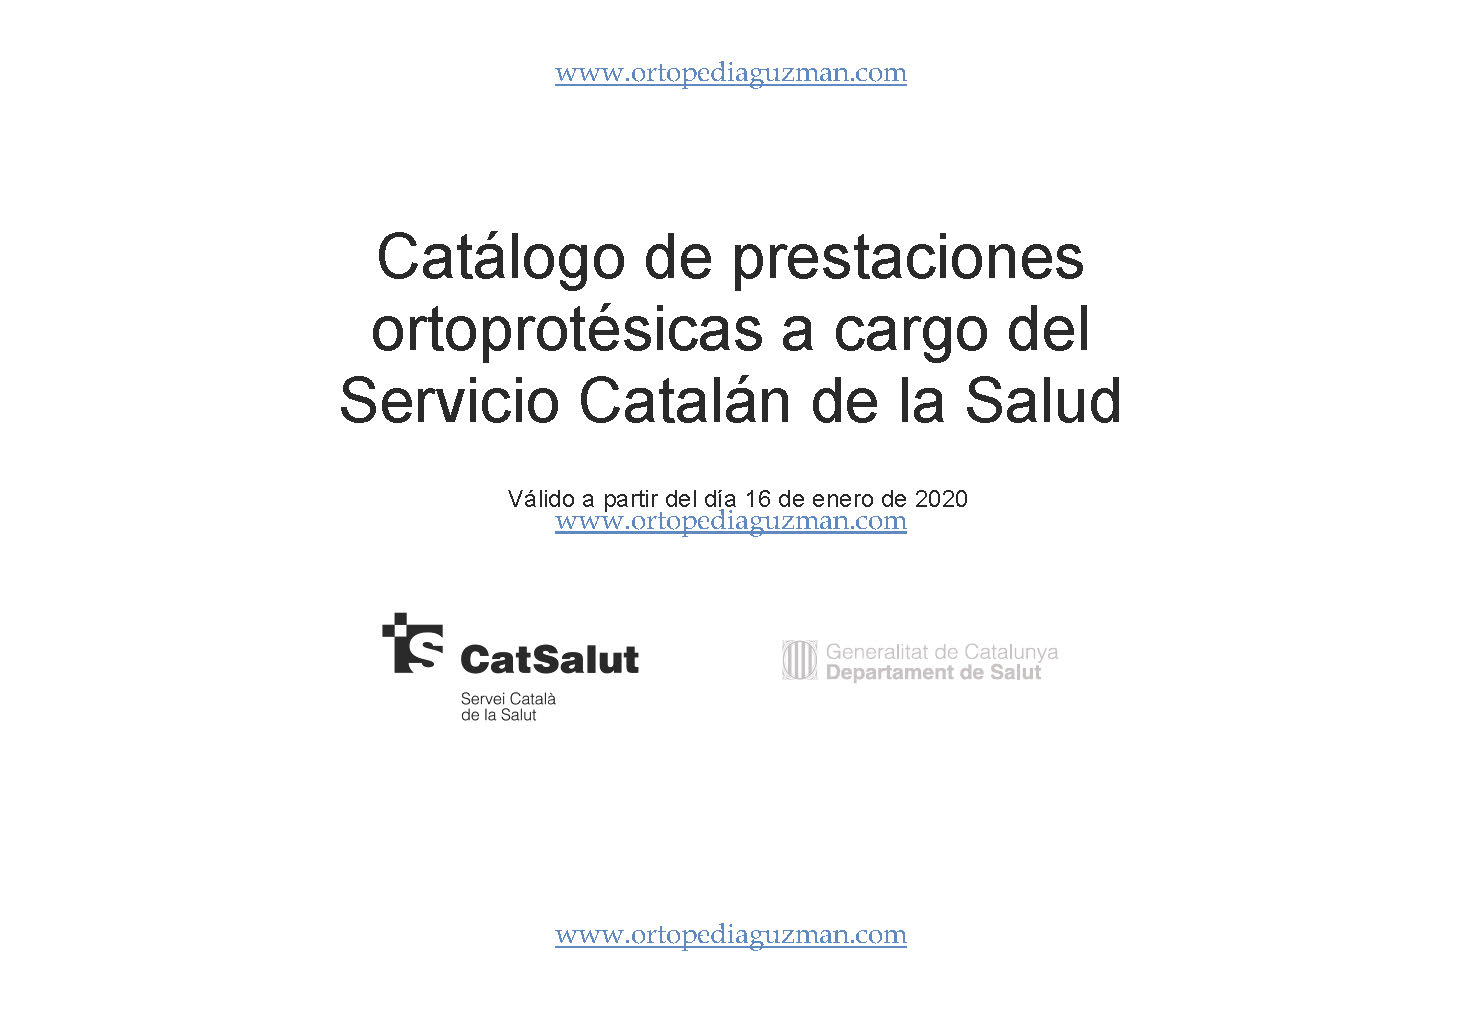 NUEVO CATÁLOGO ORTOPROTÉSICO CATSALUT 2020